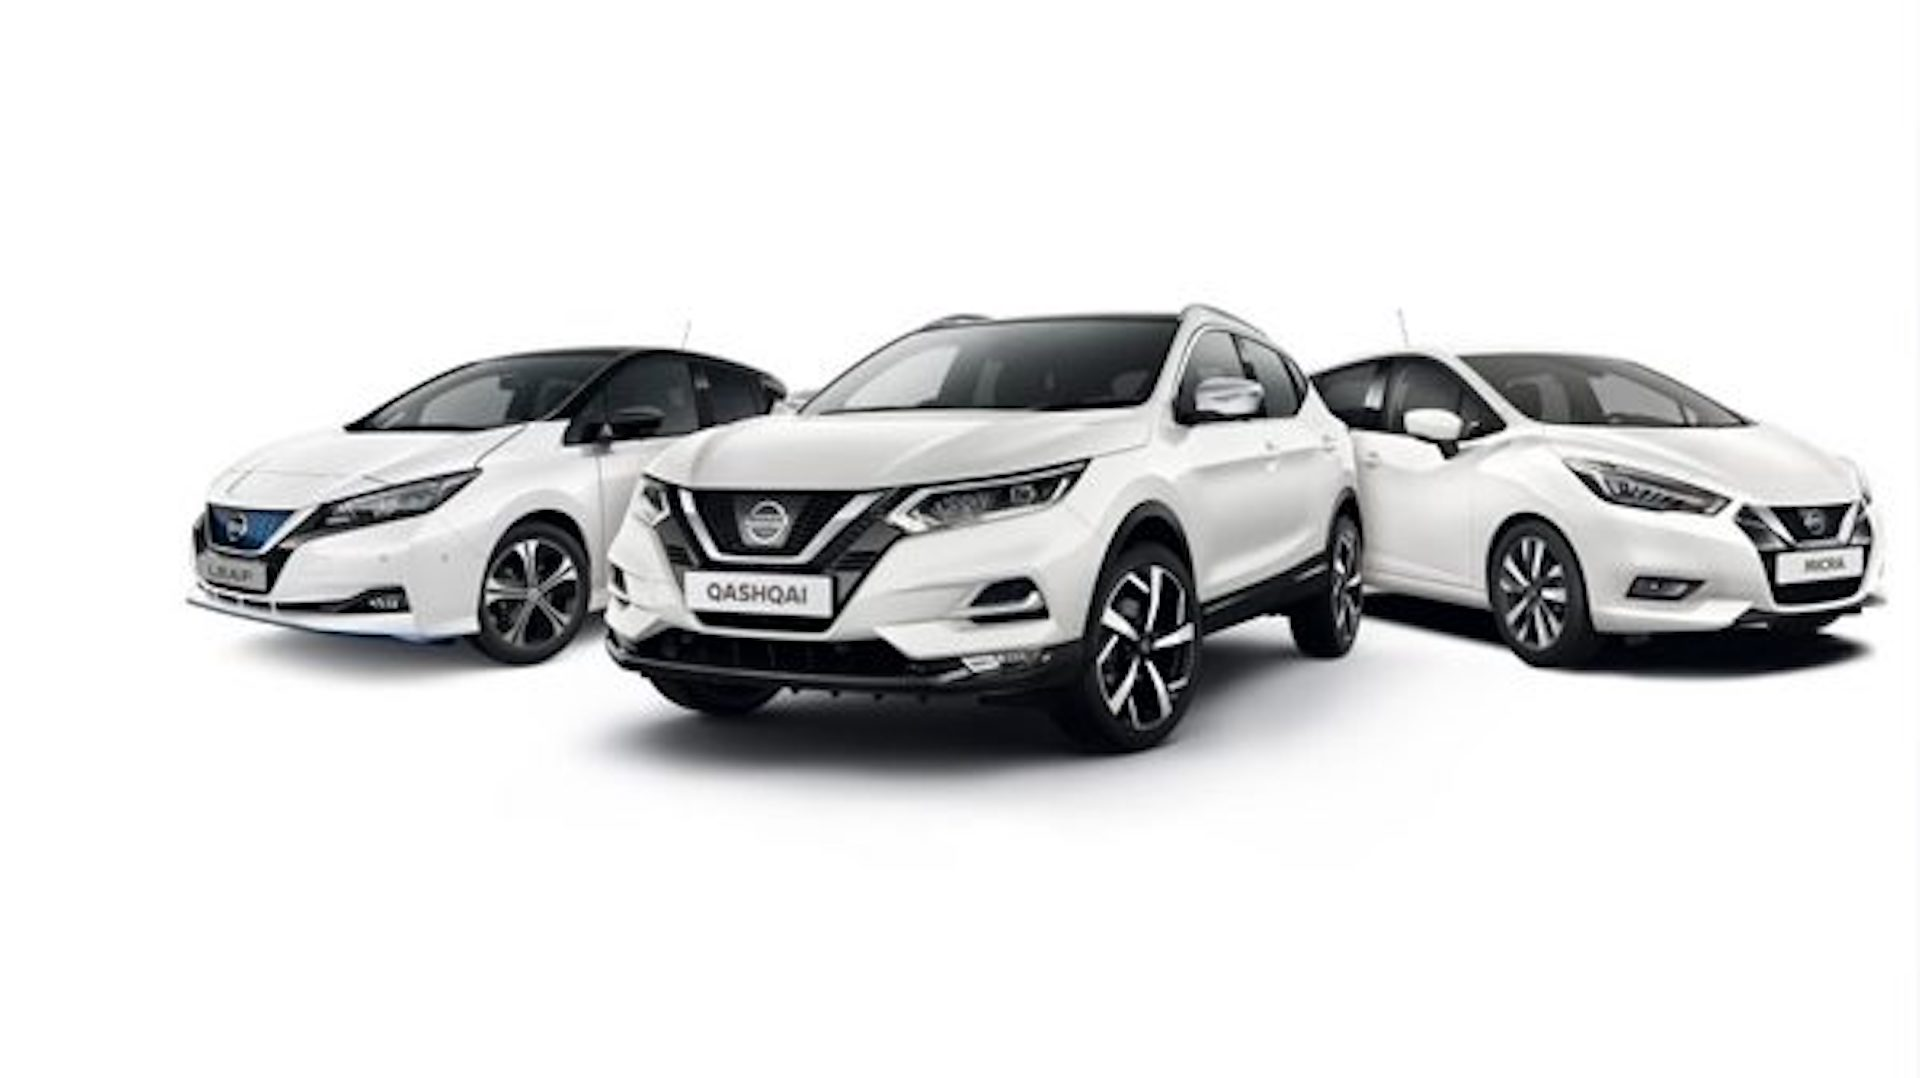 Caetano Power modelos Nissan novos